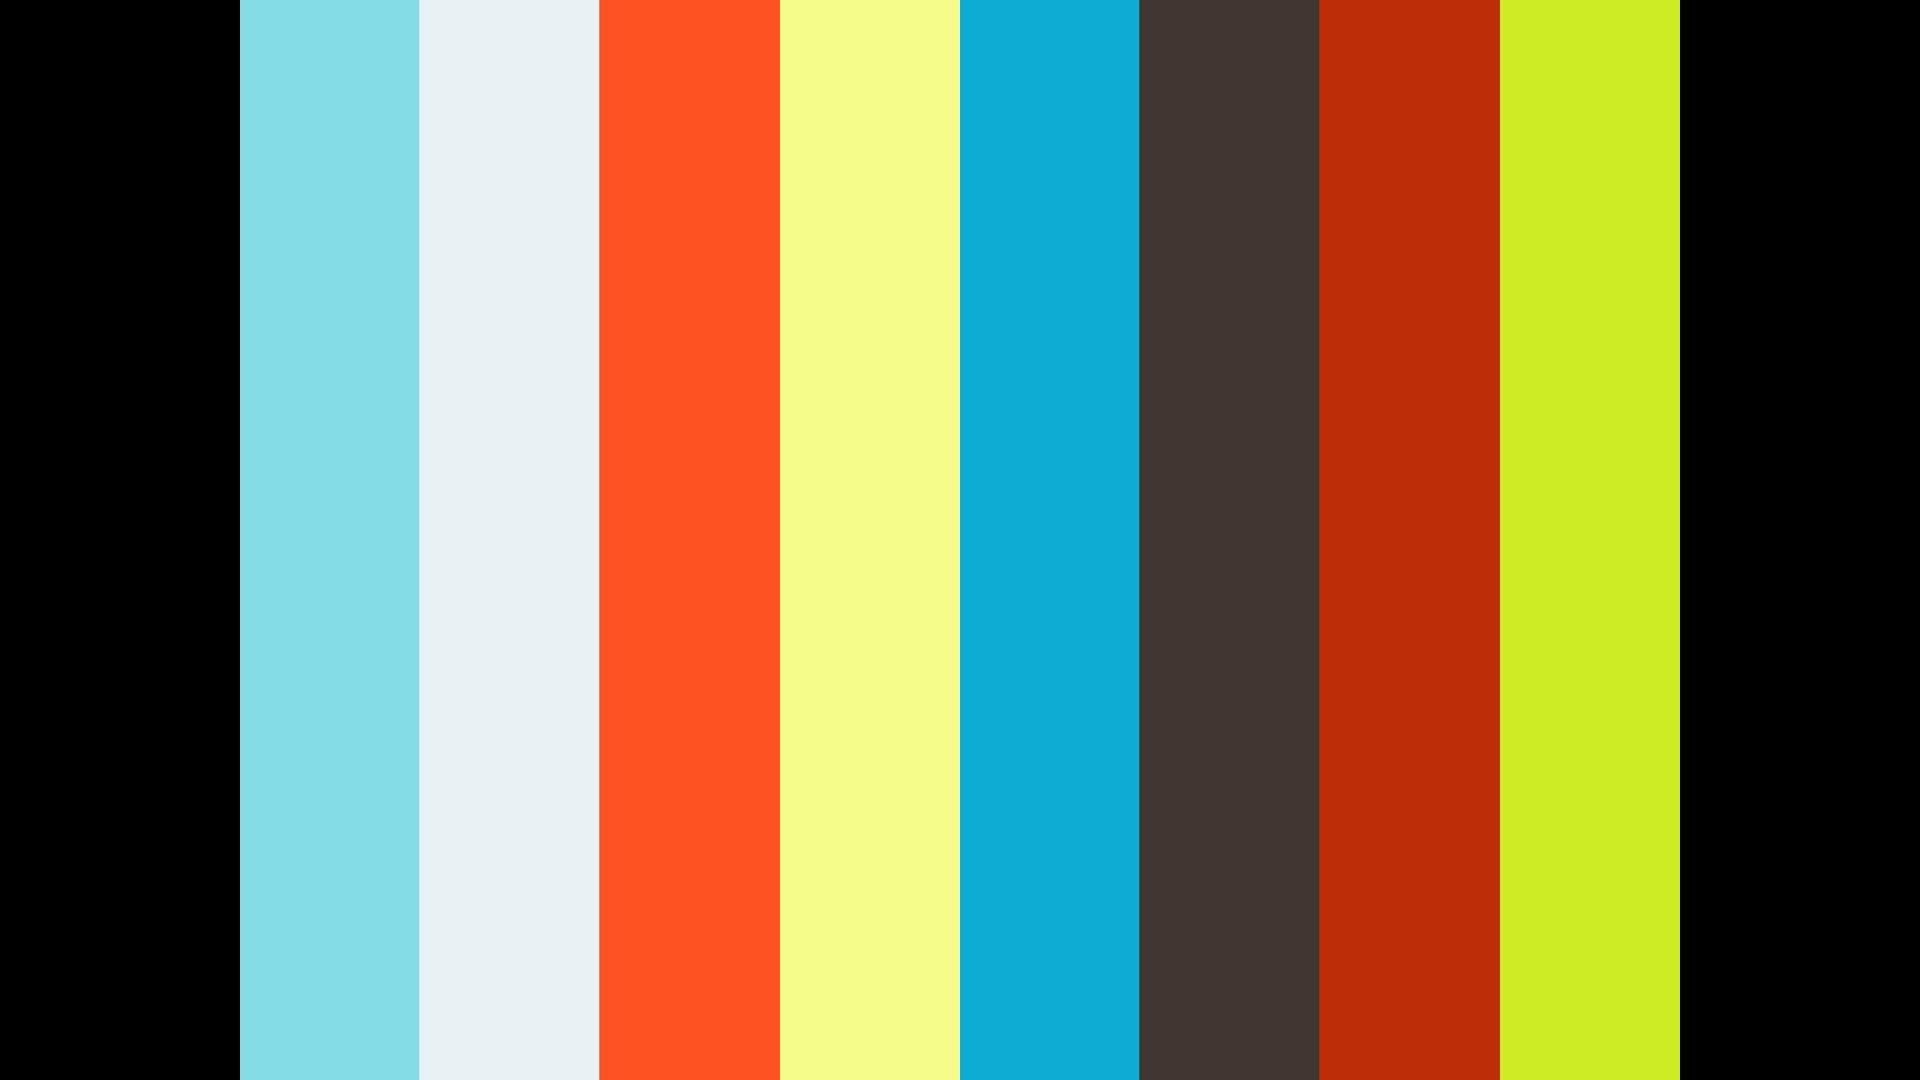 Pacma_Mision_Abolicion_v7_55s